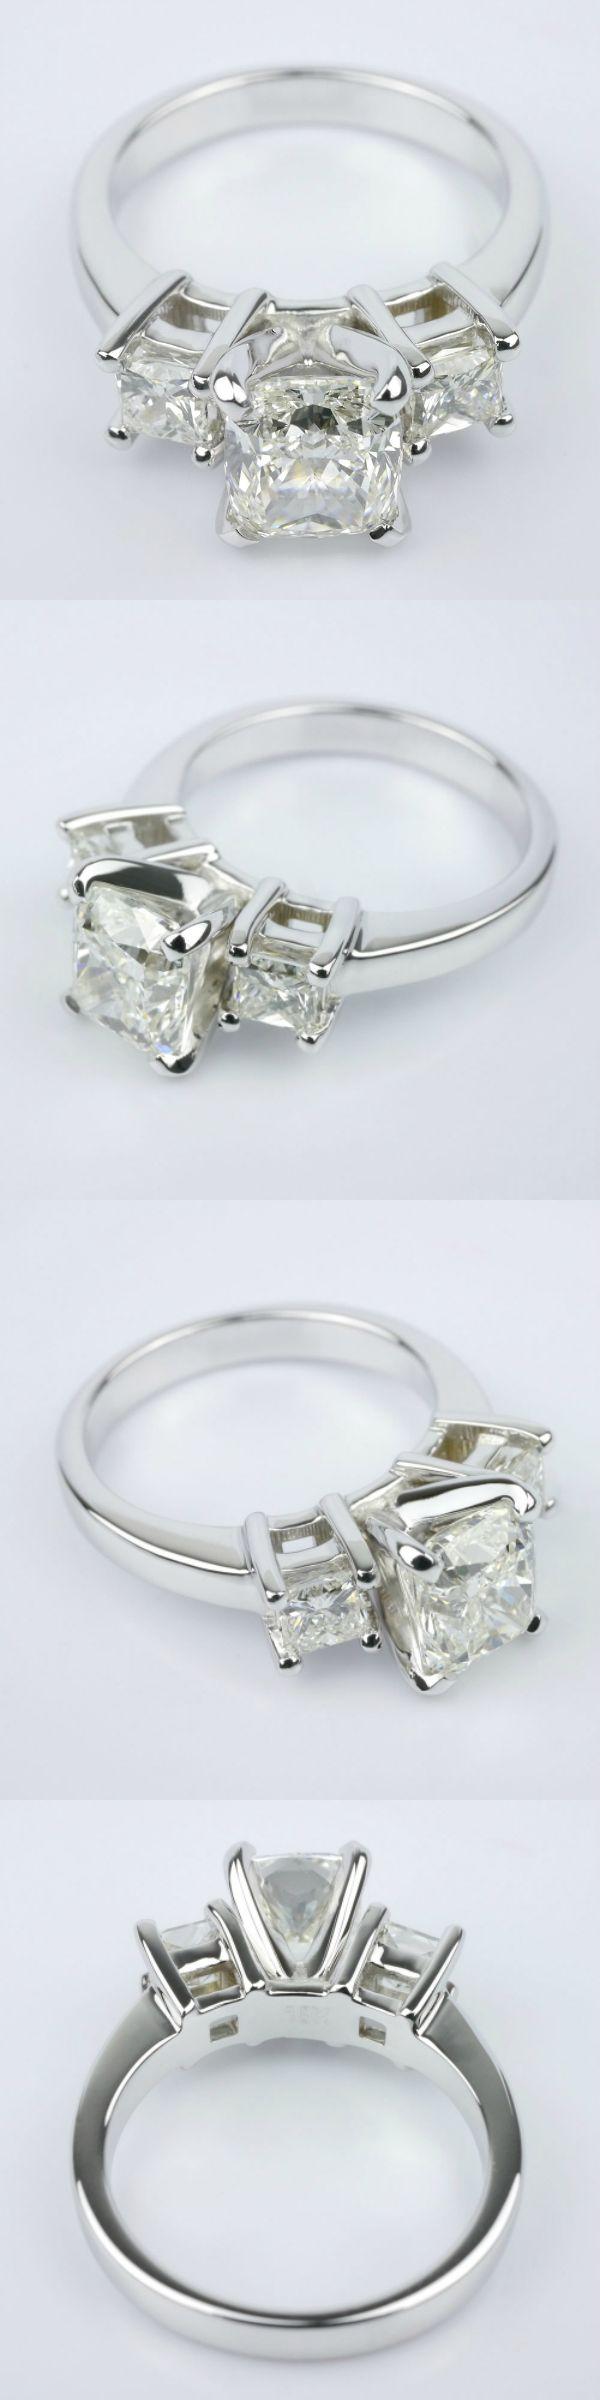 Cushion Diamond Ring With Two Princess Diamond Gem Cost 5 381